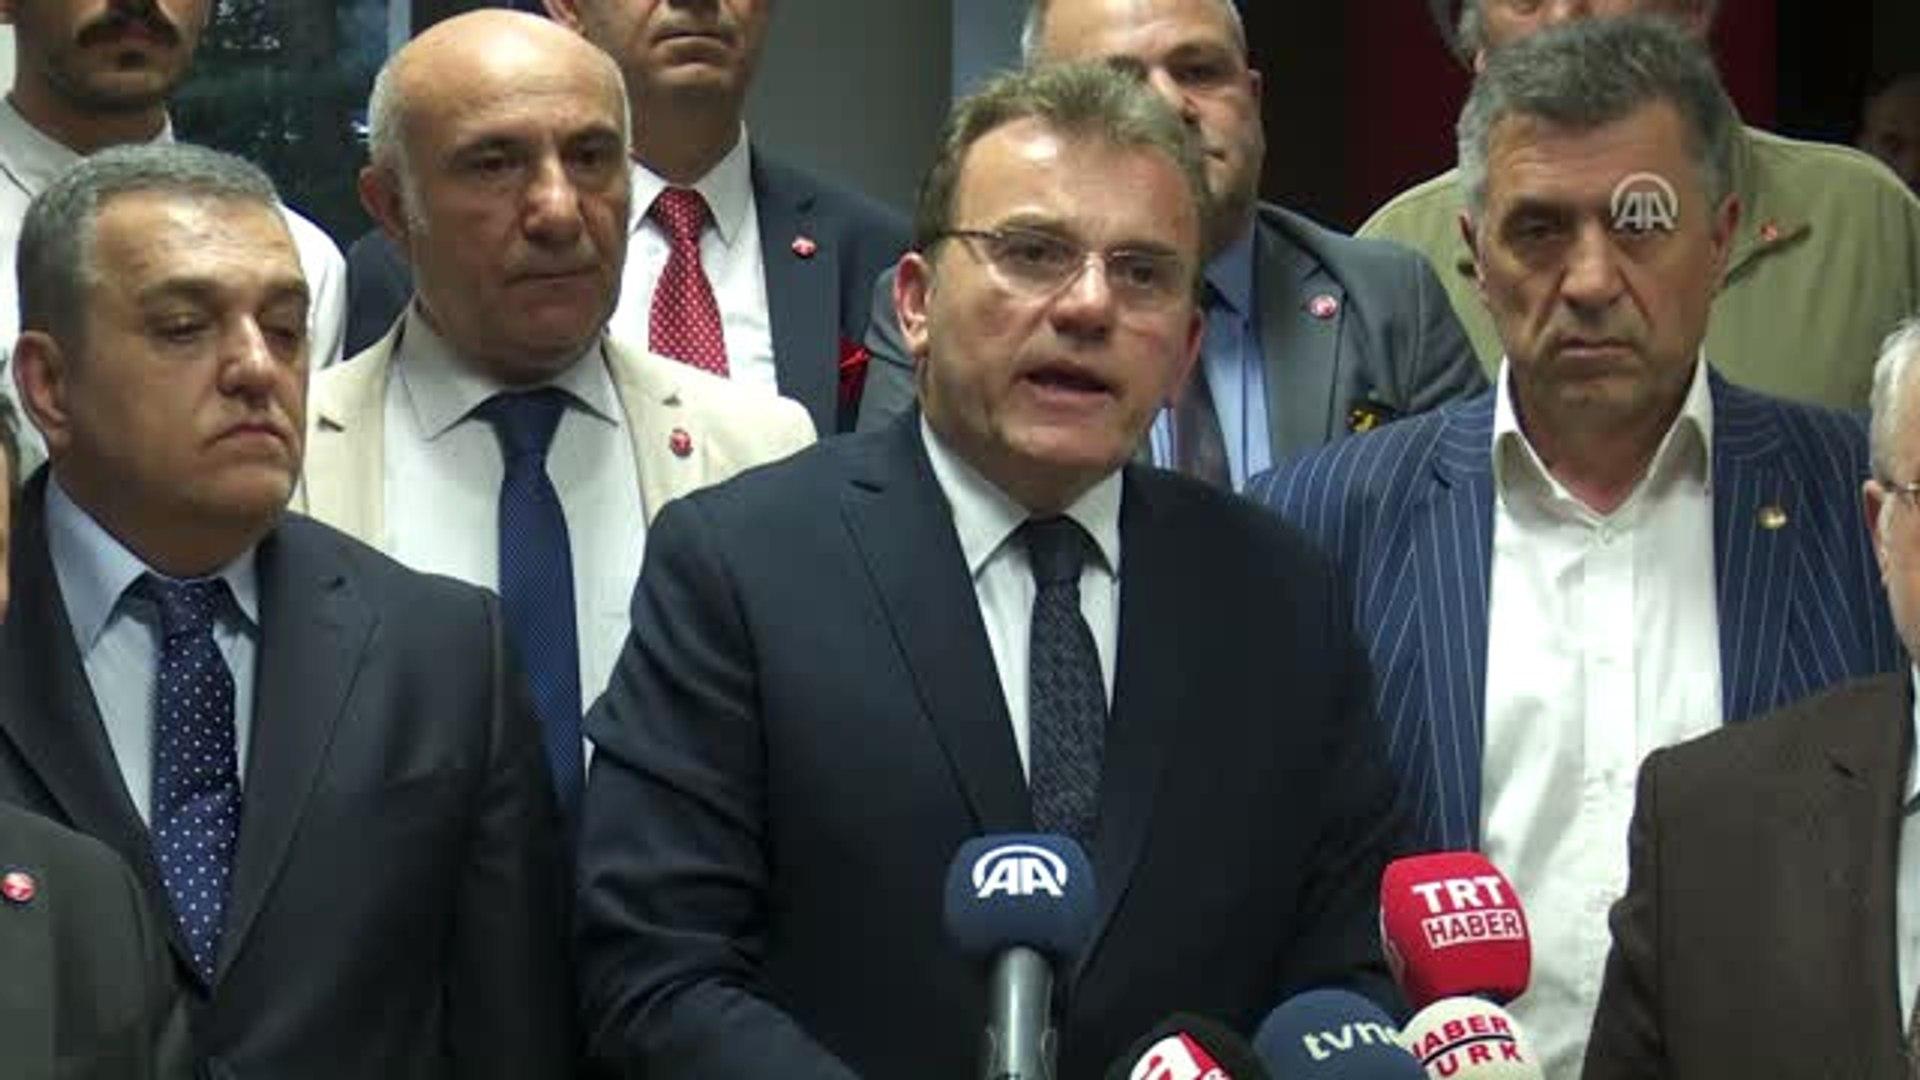 adalet partisi genel baskani oz 100 bin imzayla cumhurbaskani adayi olmak icin basvuru yapti